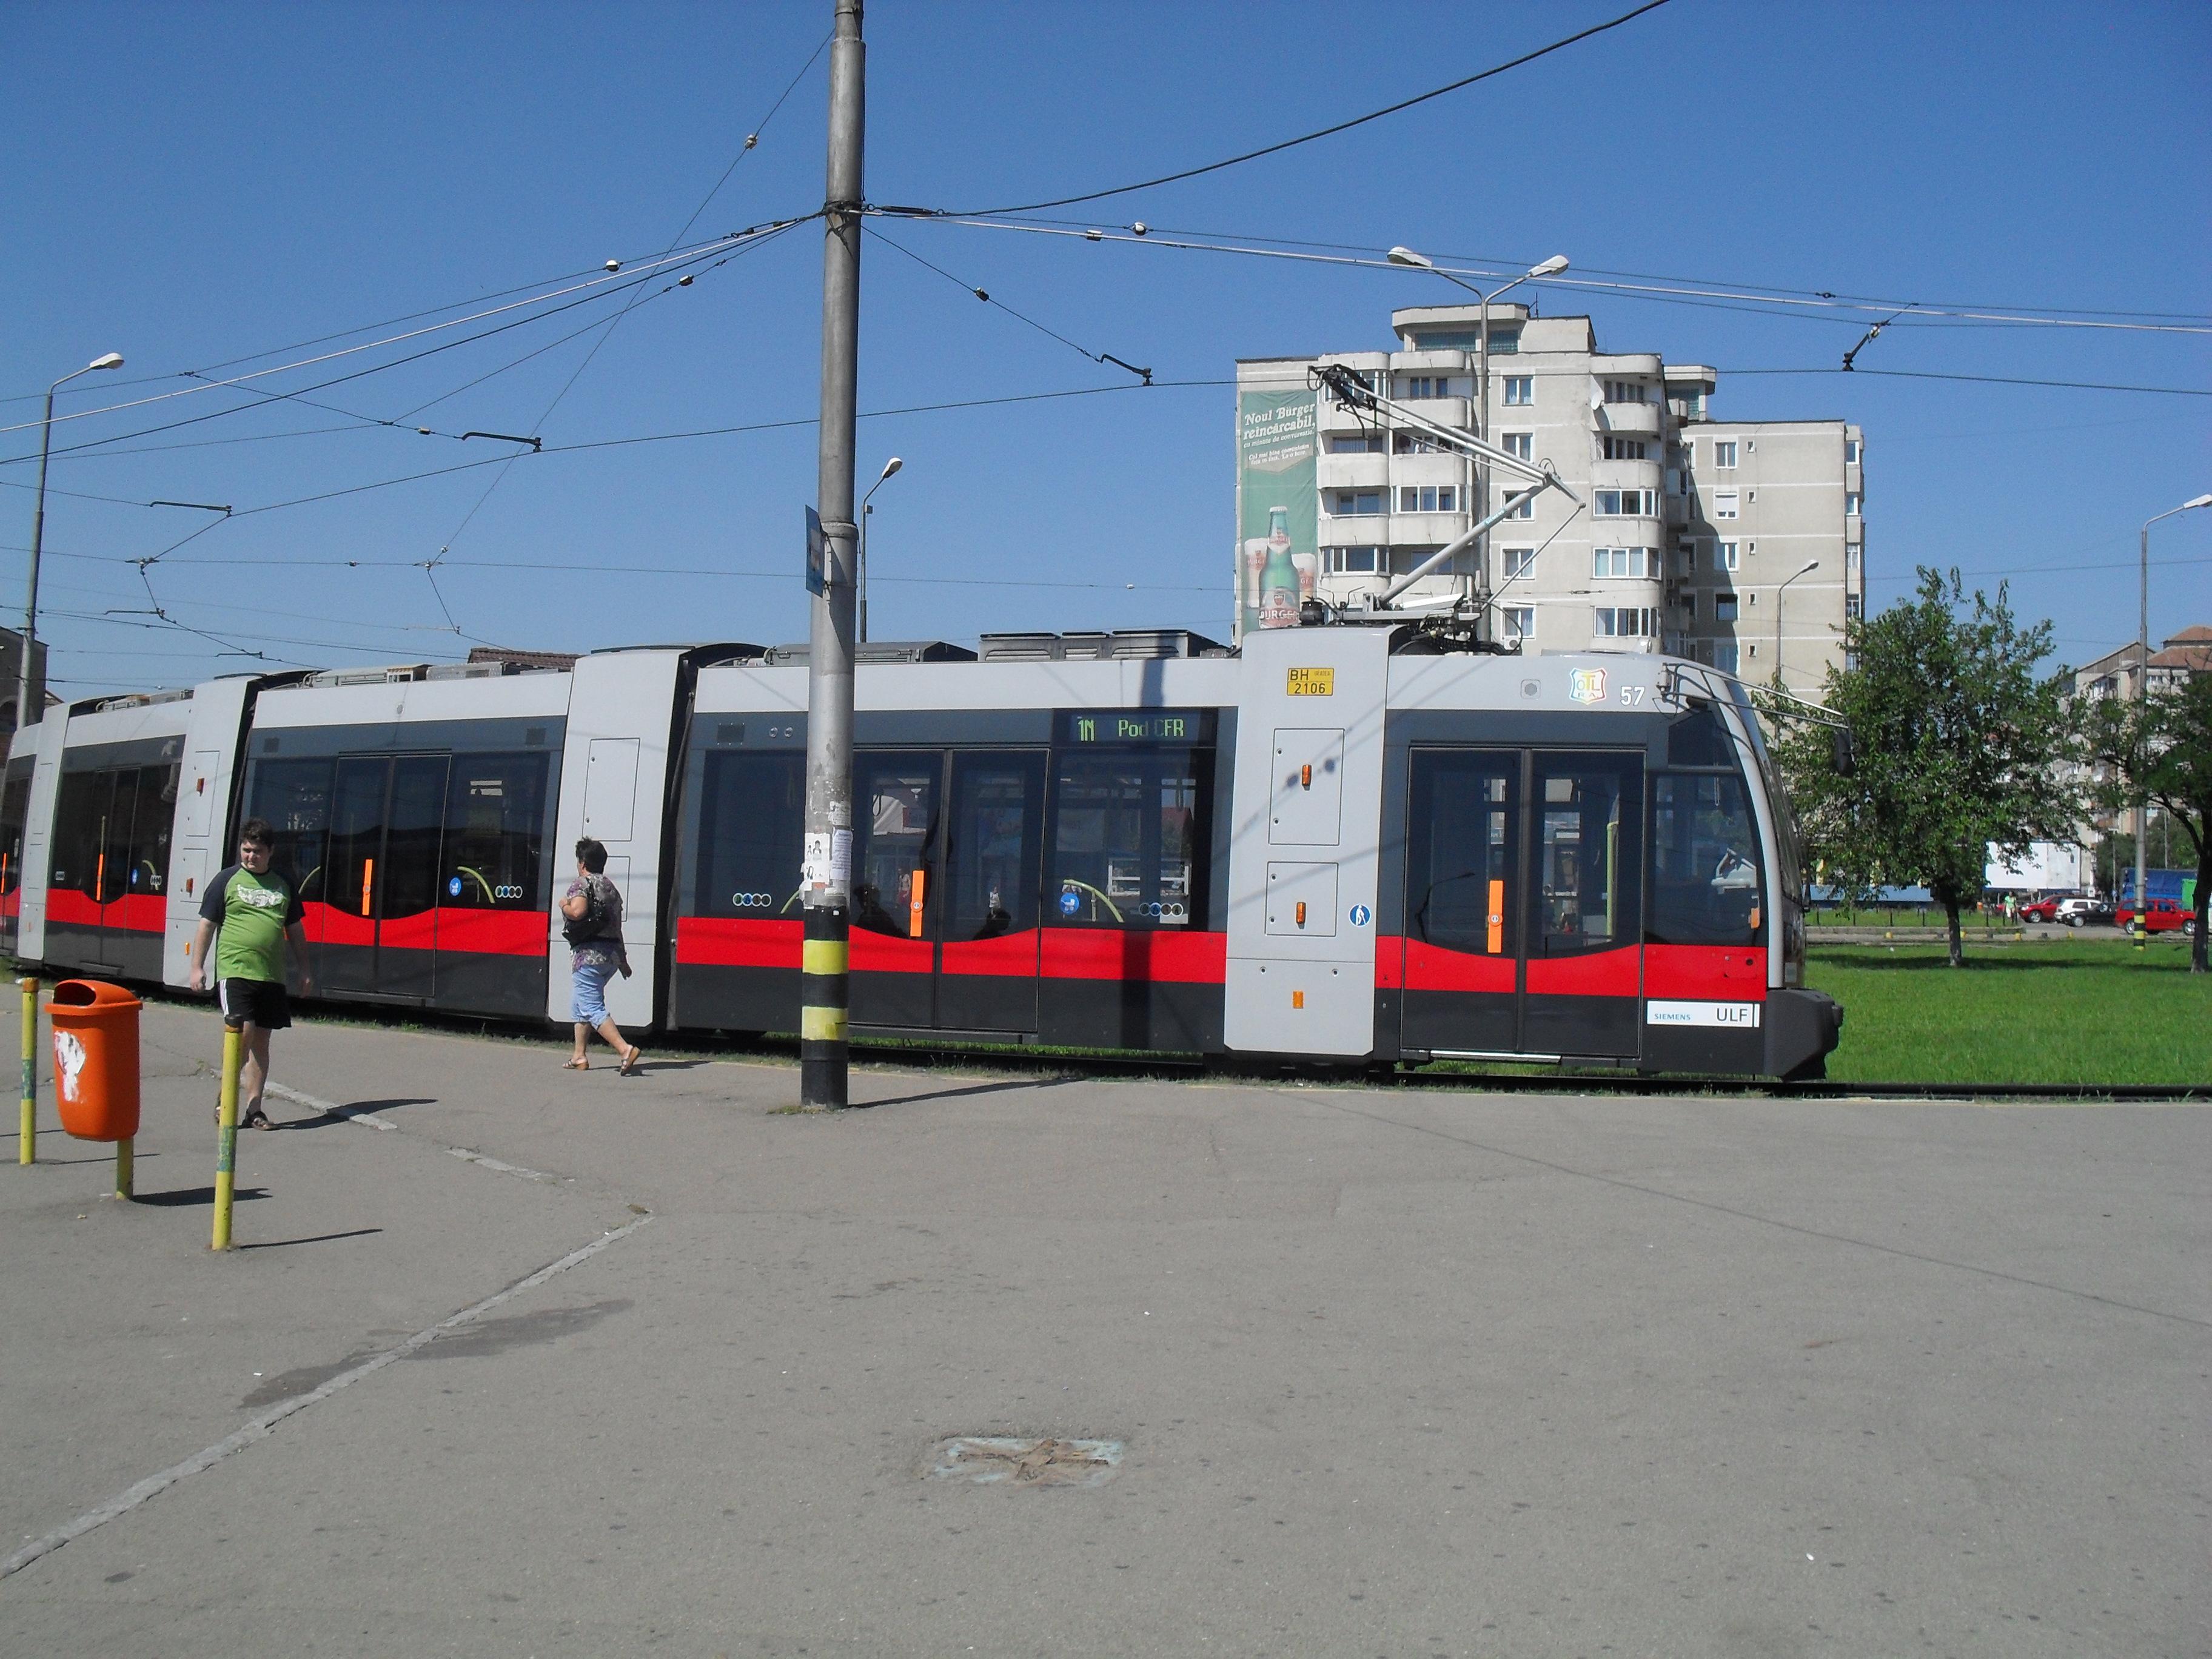 11 Martie Wikipedia: Fișier:Tramvai Siemens ULF.JPG